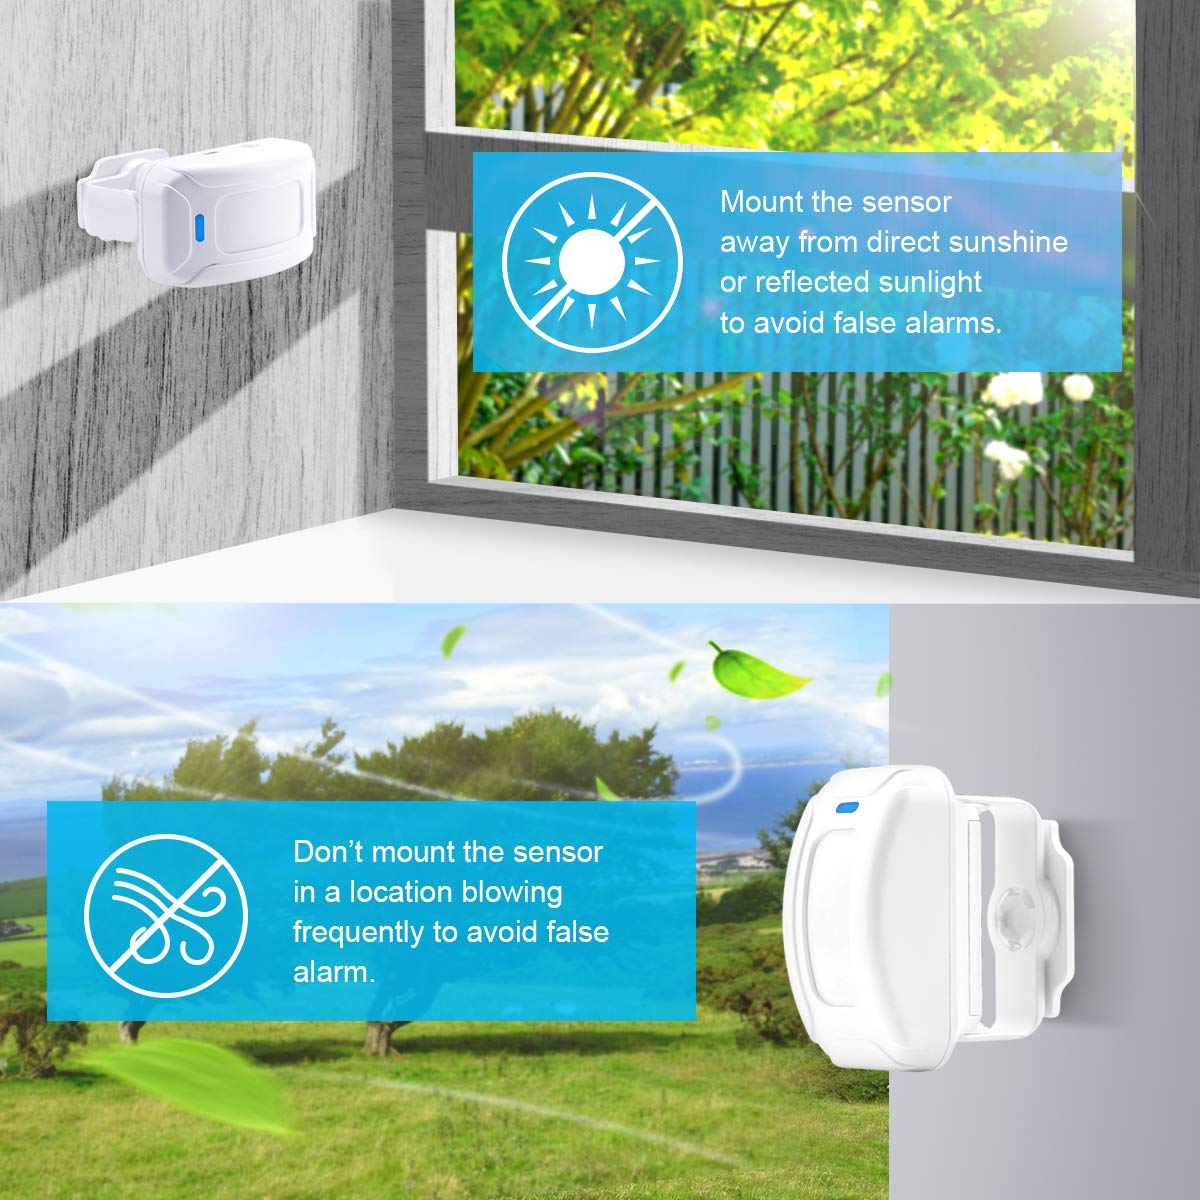 Govee Home Security Driveway Alarmwireless Motion Shadow Sensor Alarm Detector 1 Receiver 2 Detectorlong Detect Range